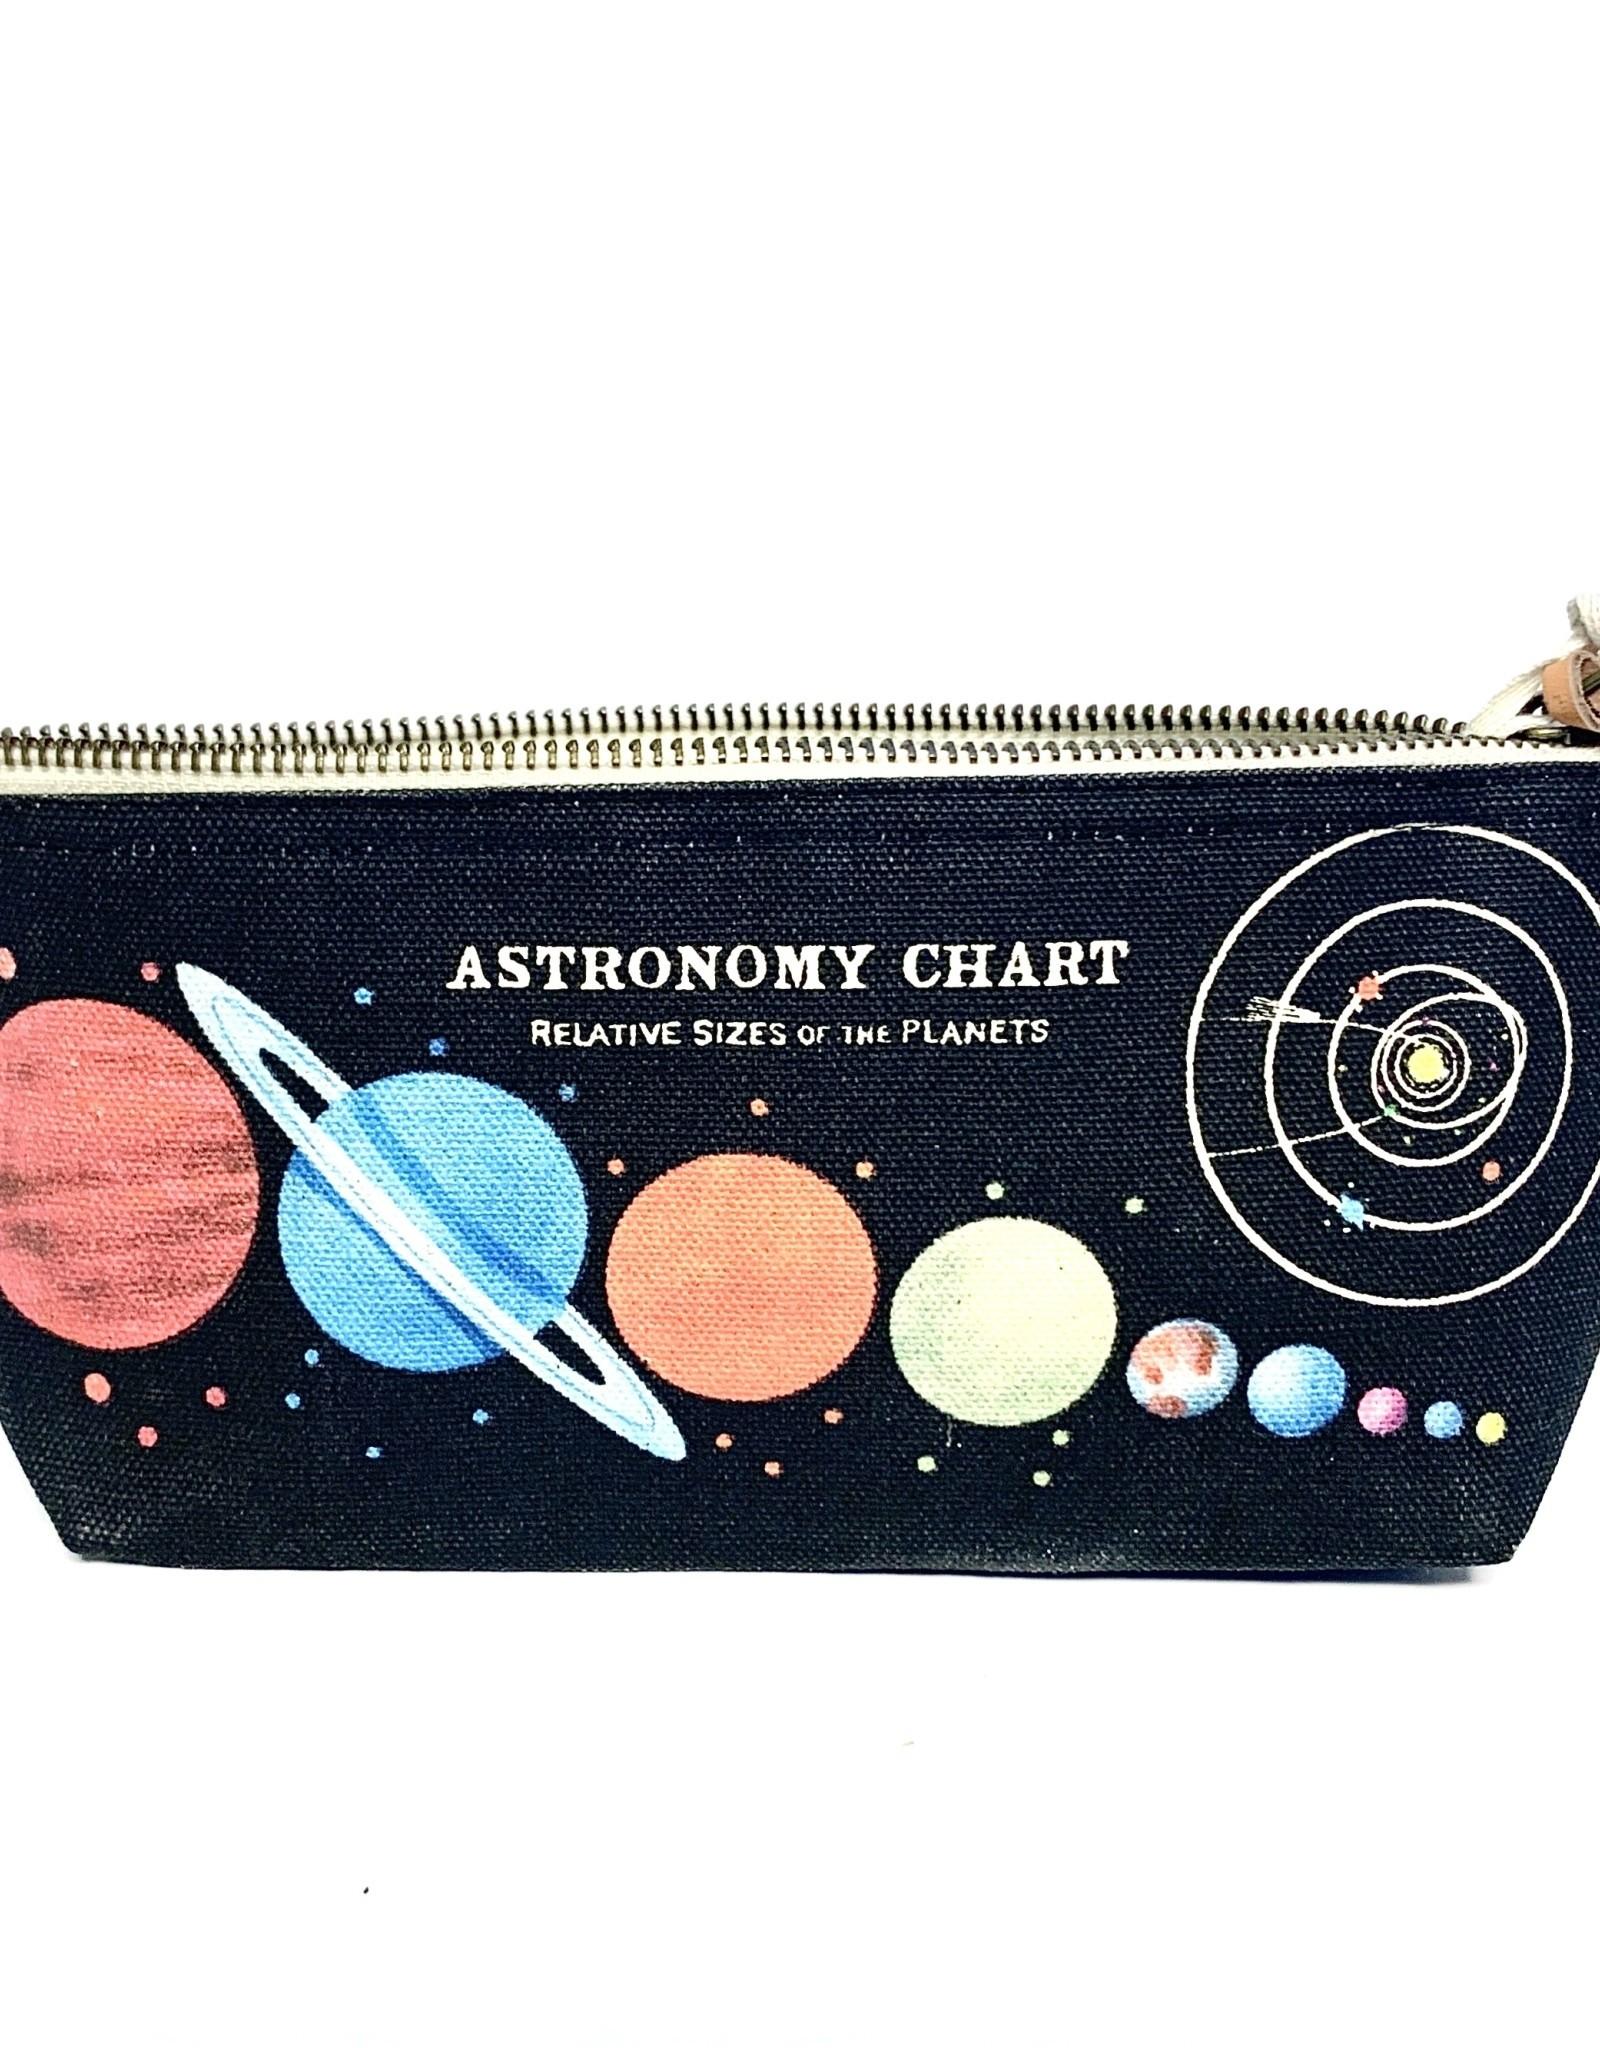 Cavallini Cavallini Vintage Inspired Mini Pouch, Astronomy Chart